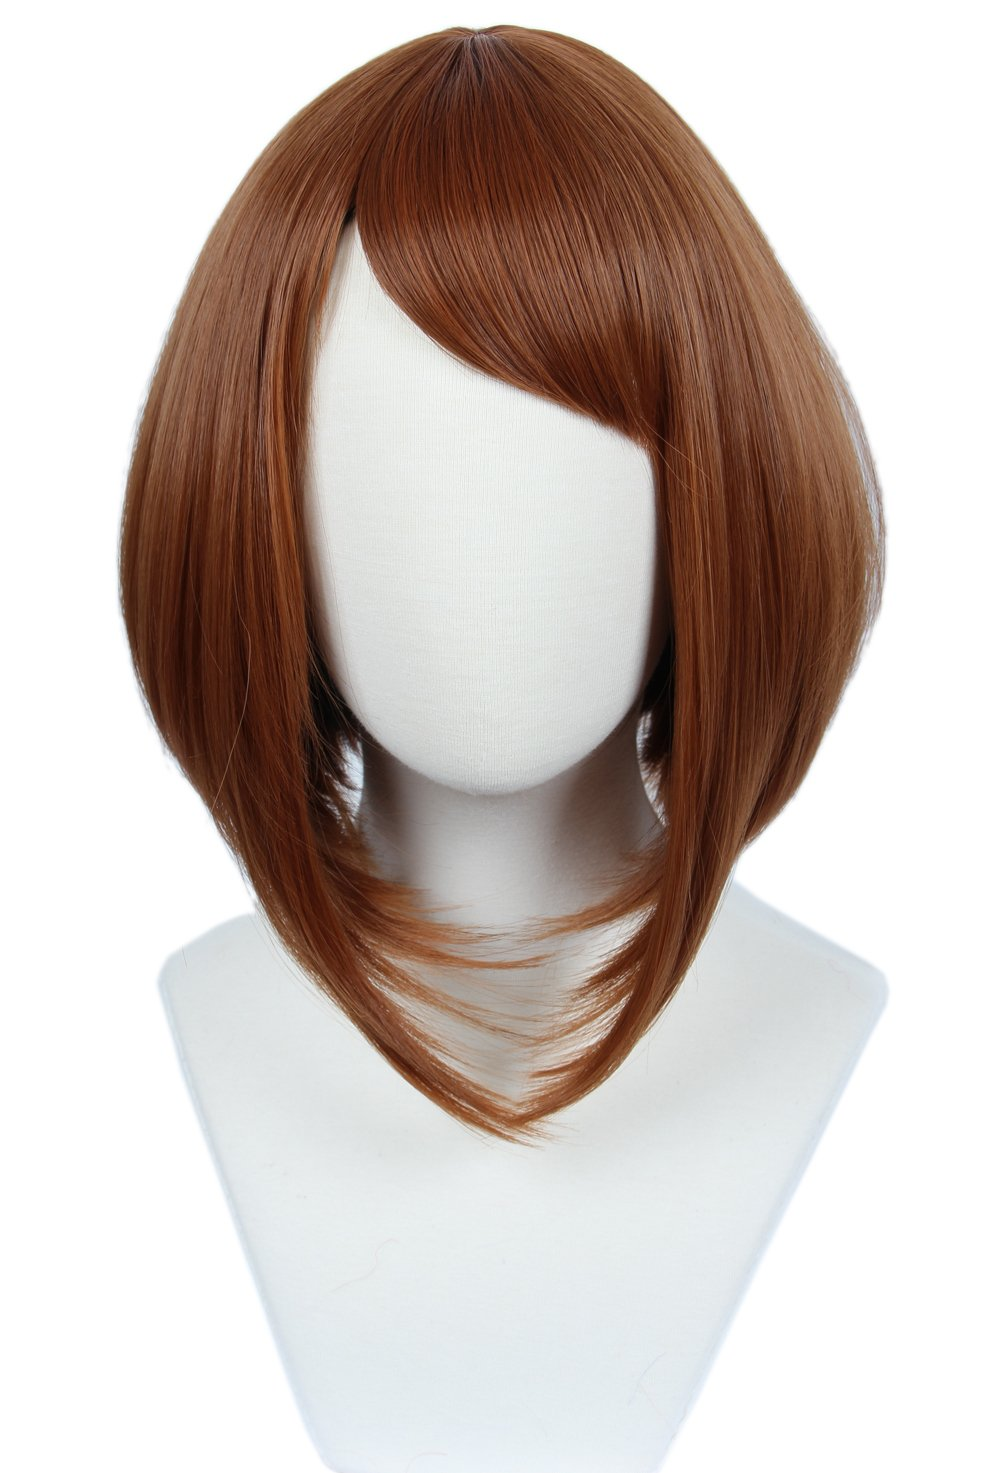 Linfairy Women's Brown Cosplay Wig Halloween Costume Party Wig